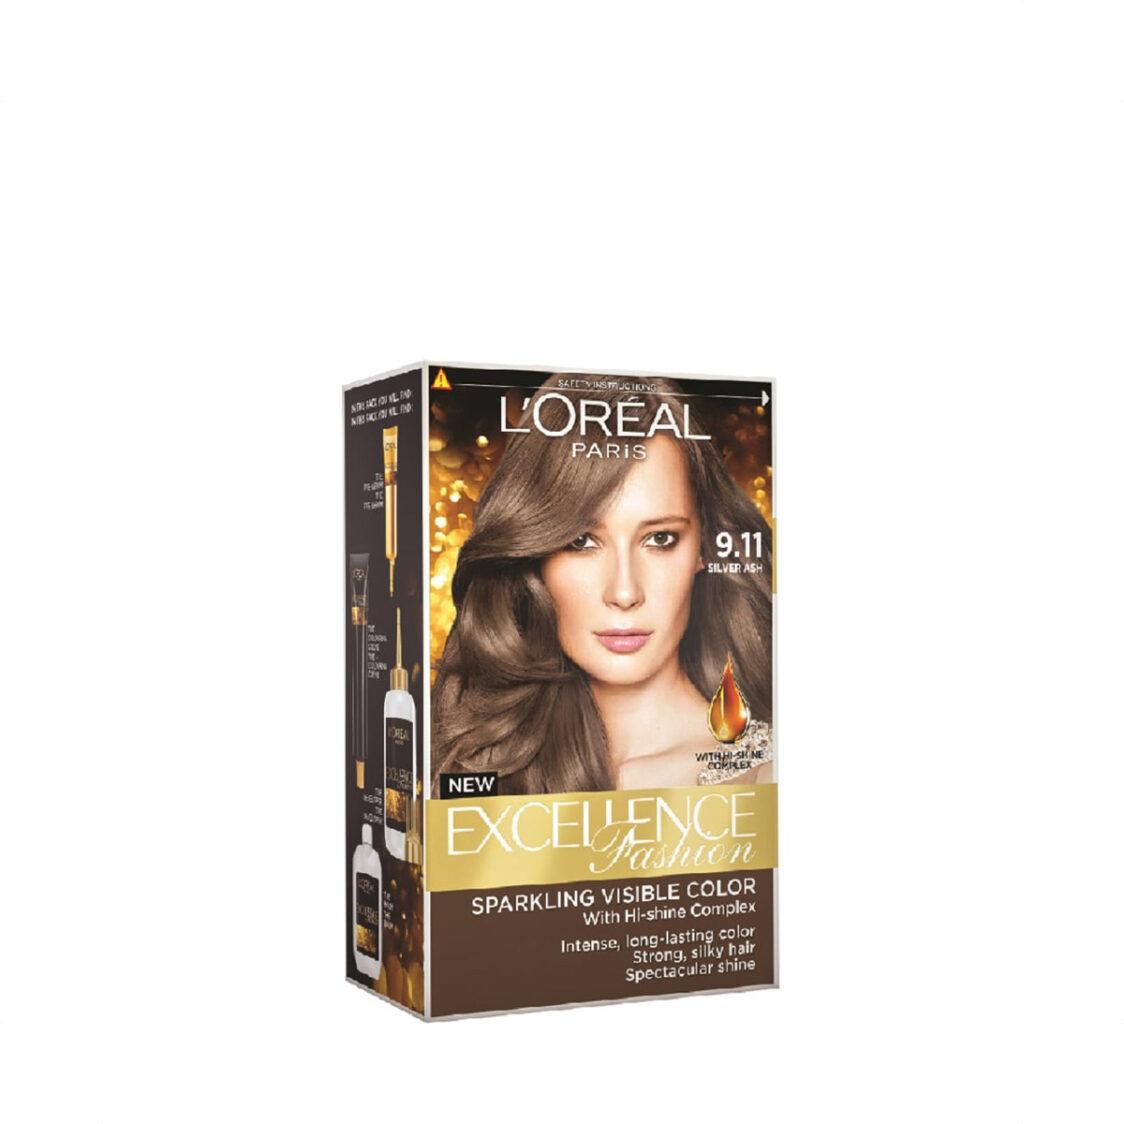 LOreal Paris Excellence Fashion